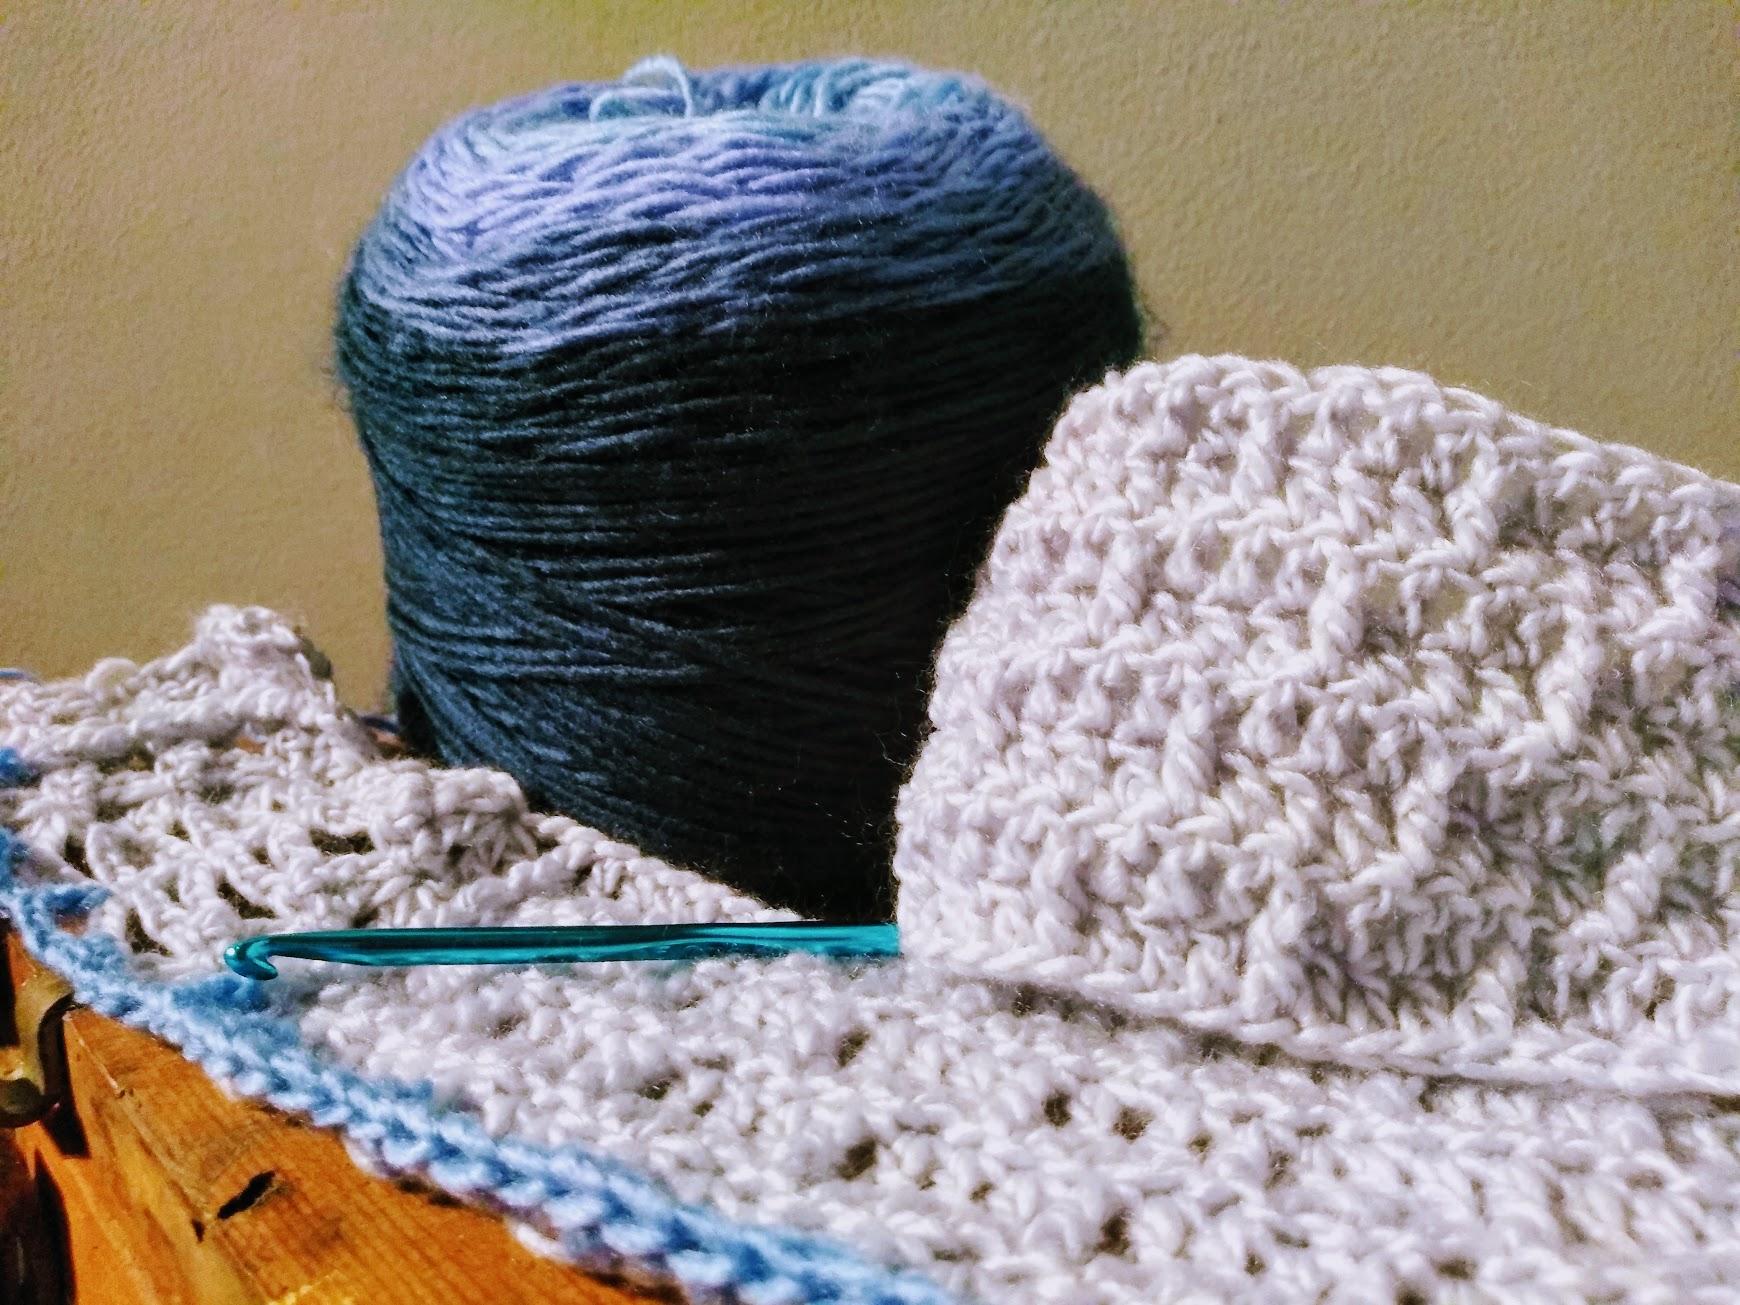 Crochet Charity Blanket